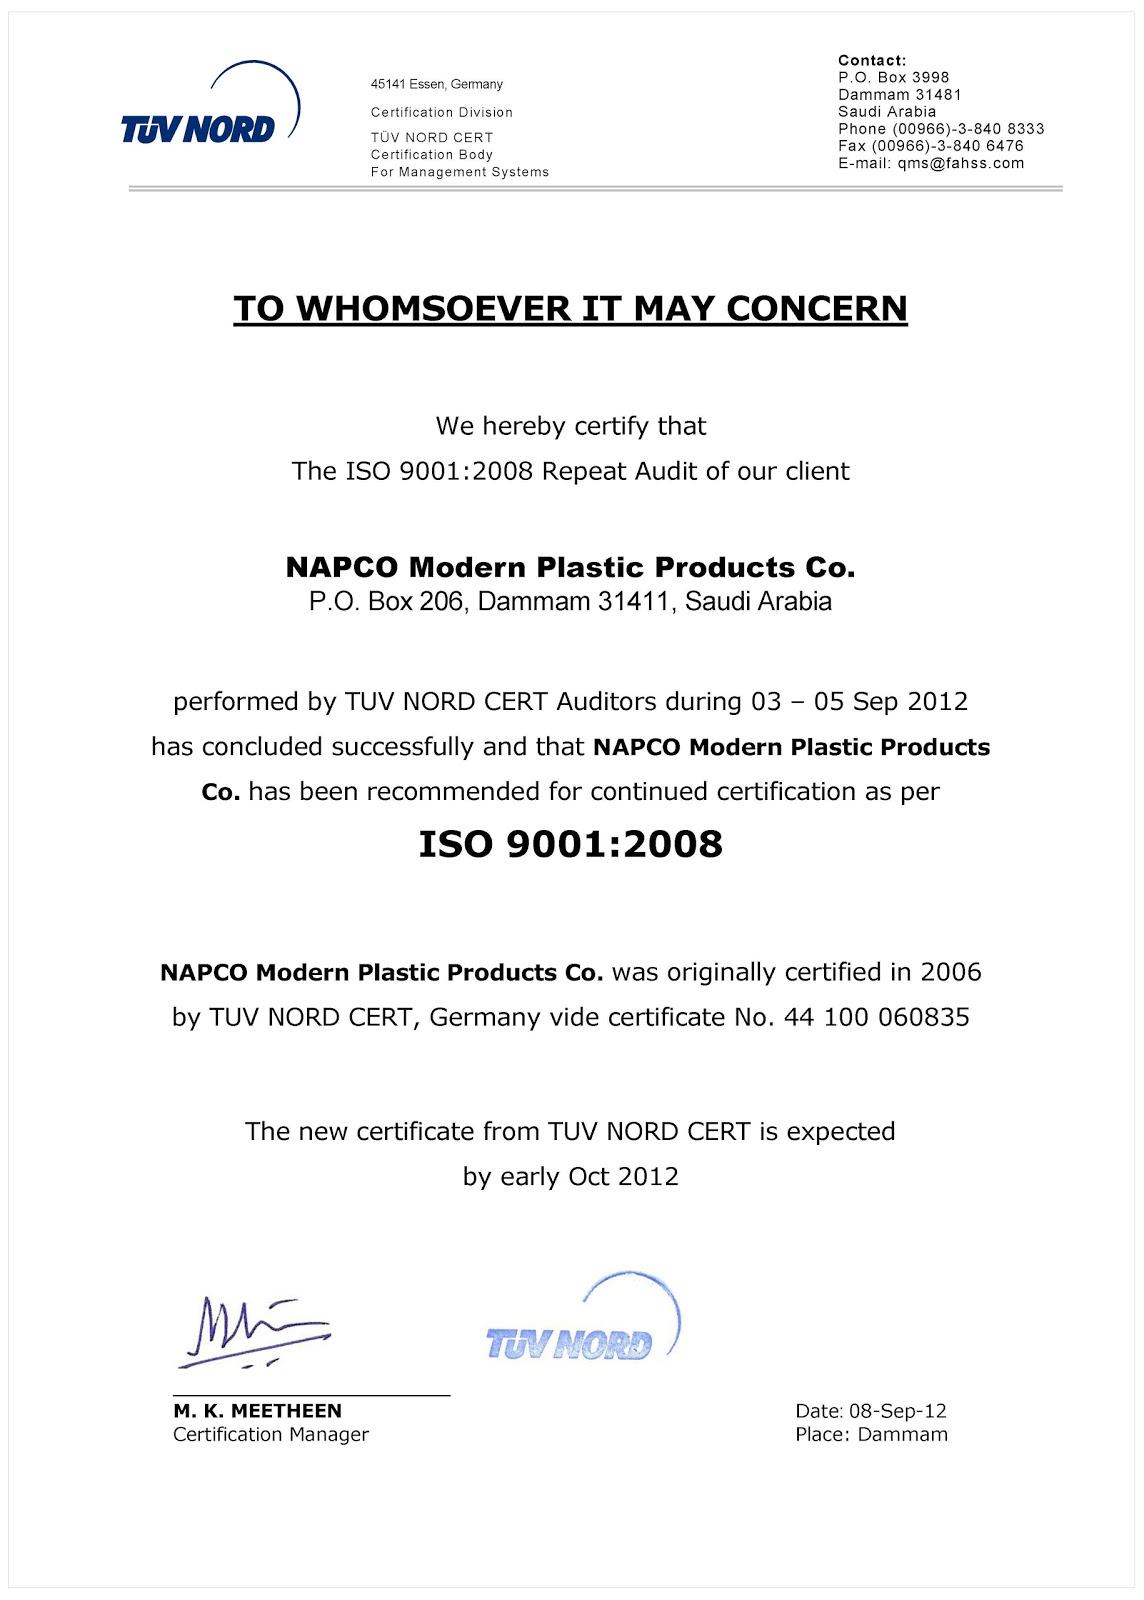 OUTBOUND E-newsletter: Napco Modern Sack Division Renews ISO 9001